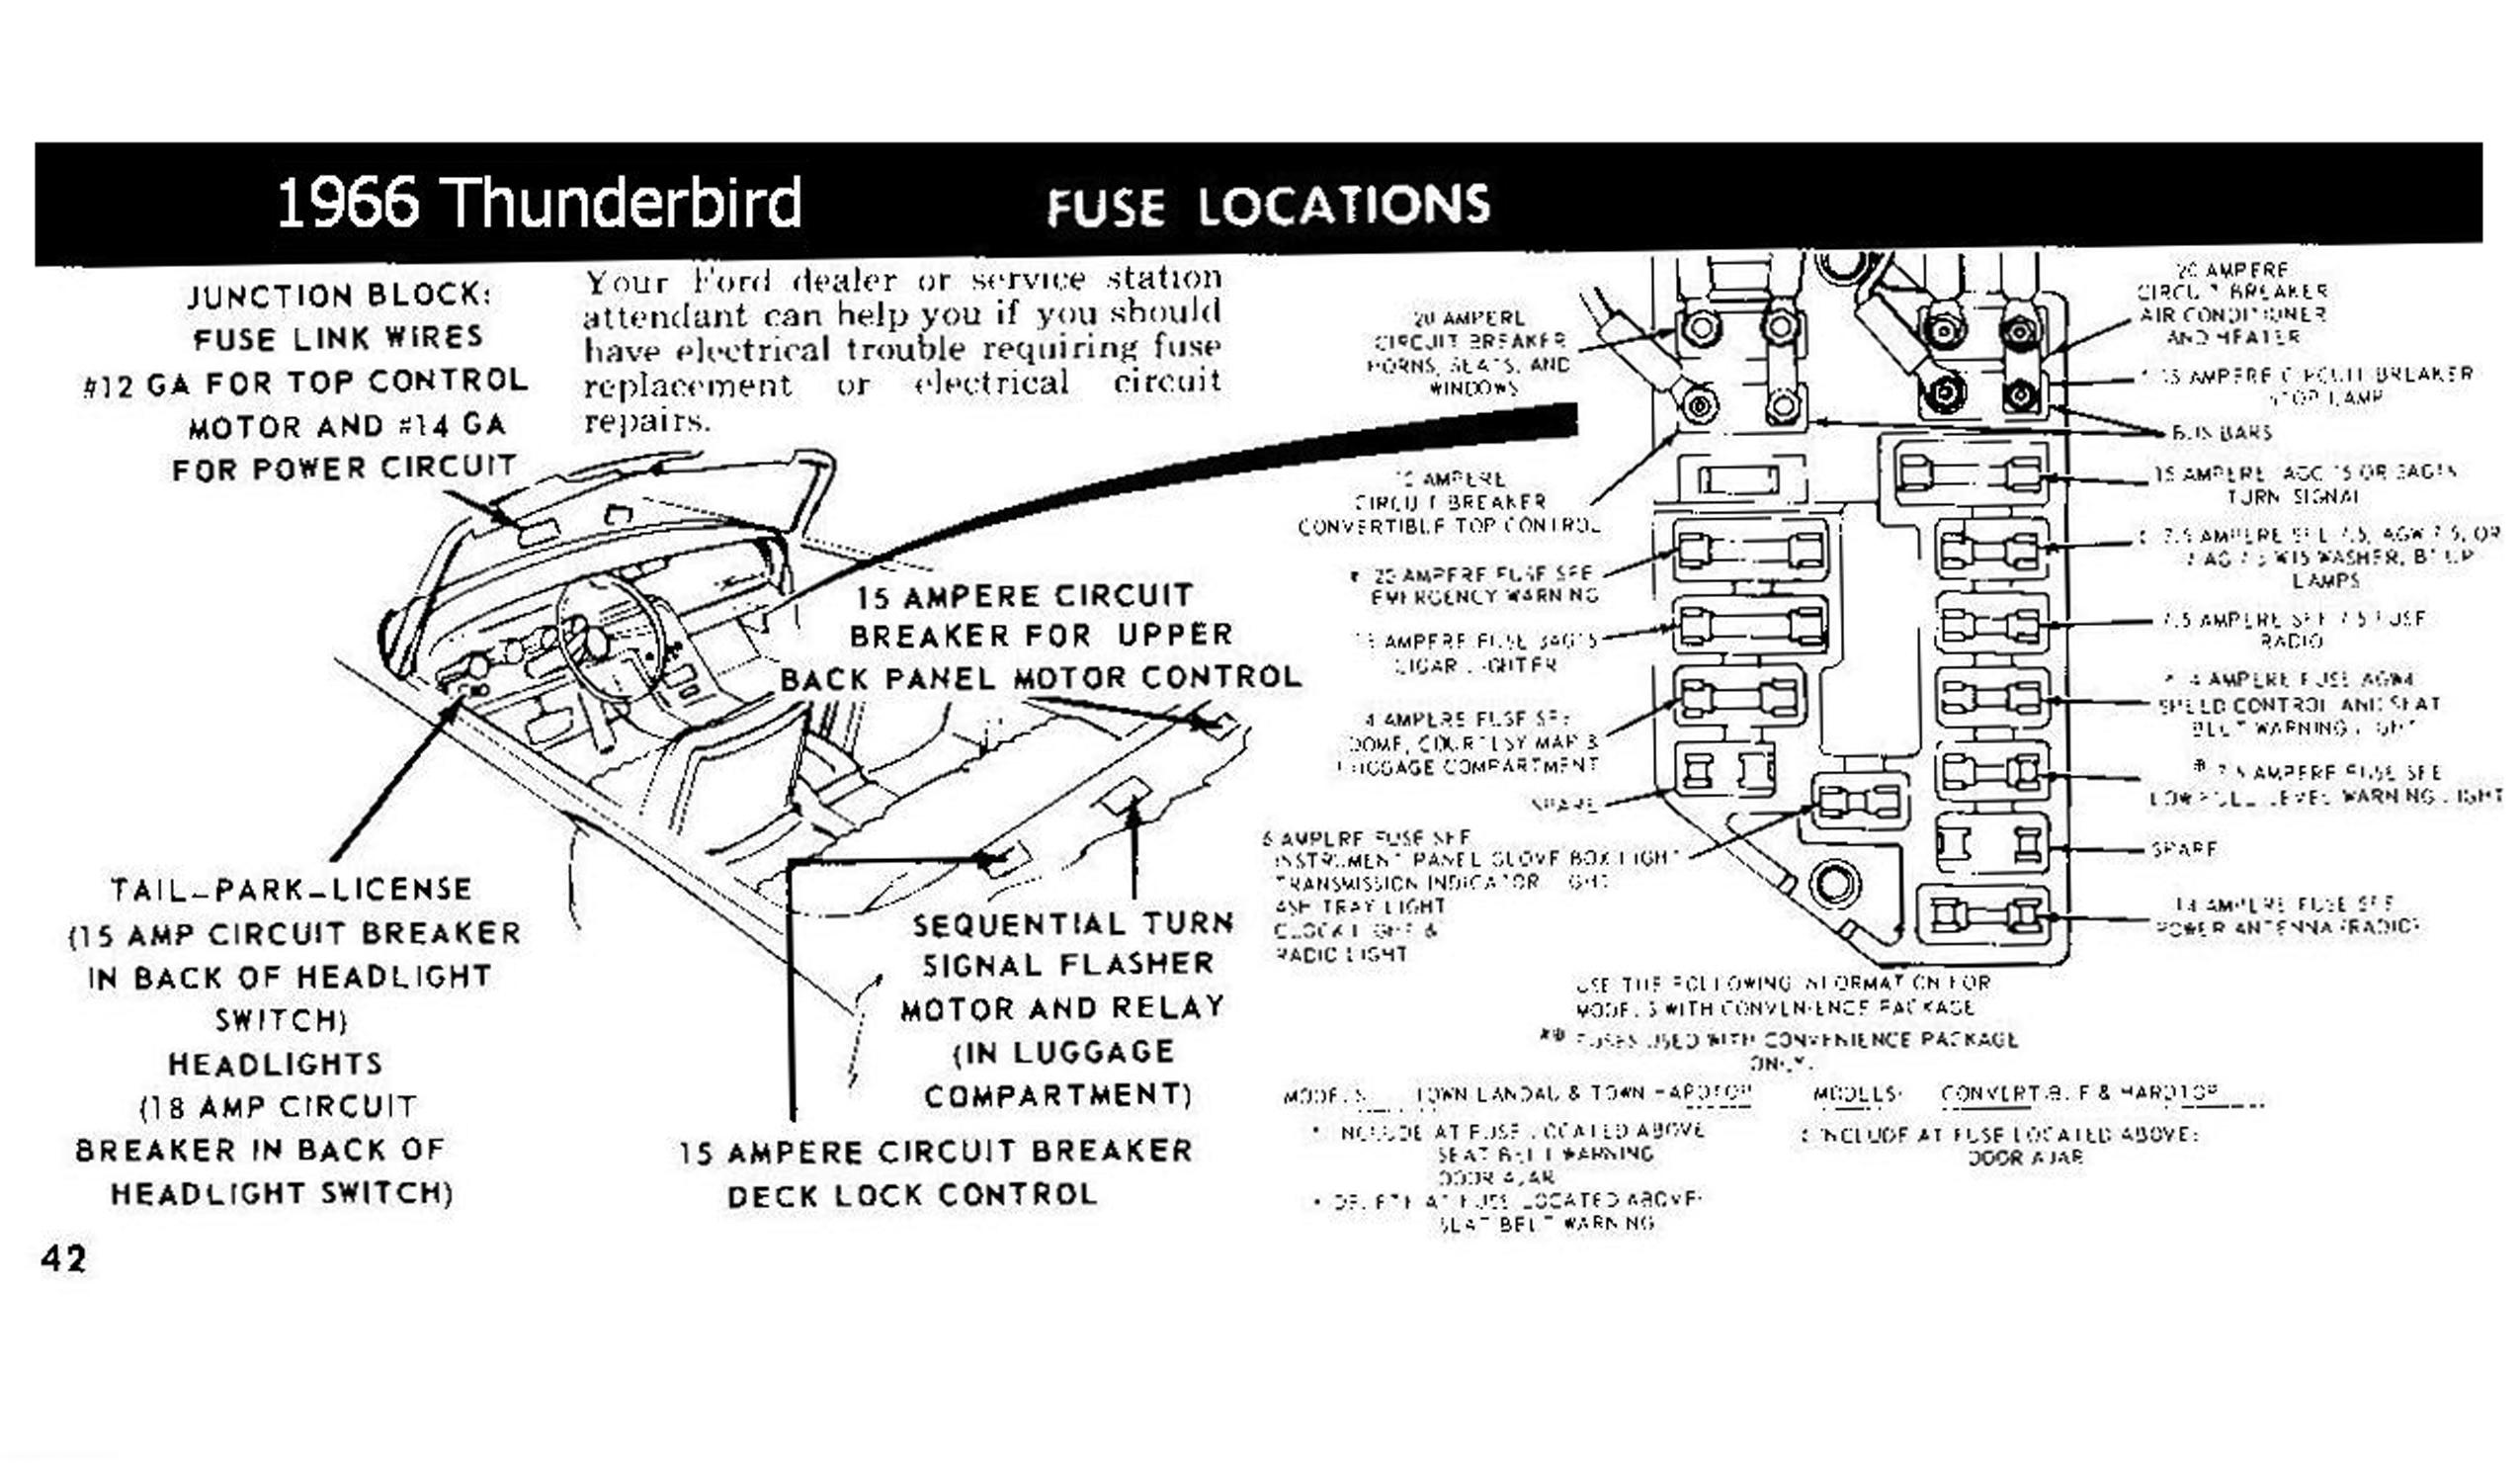 1964 ford thunderbird fuse box location